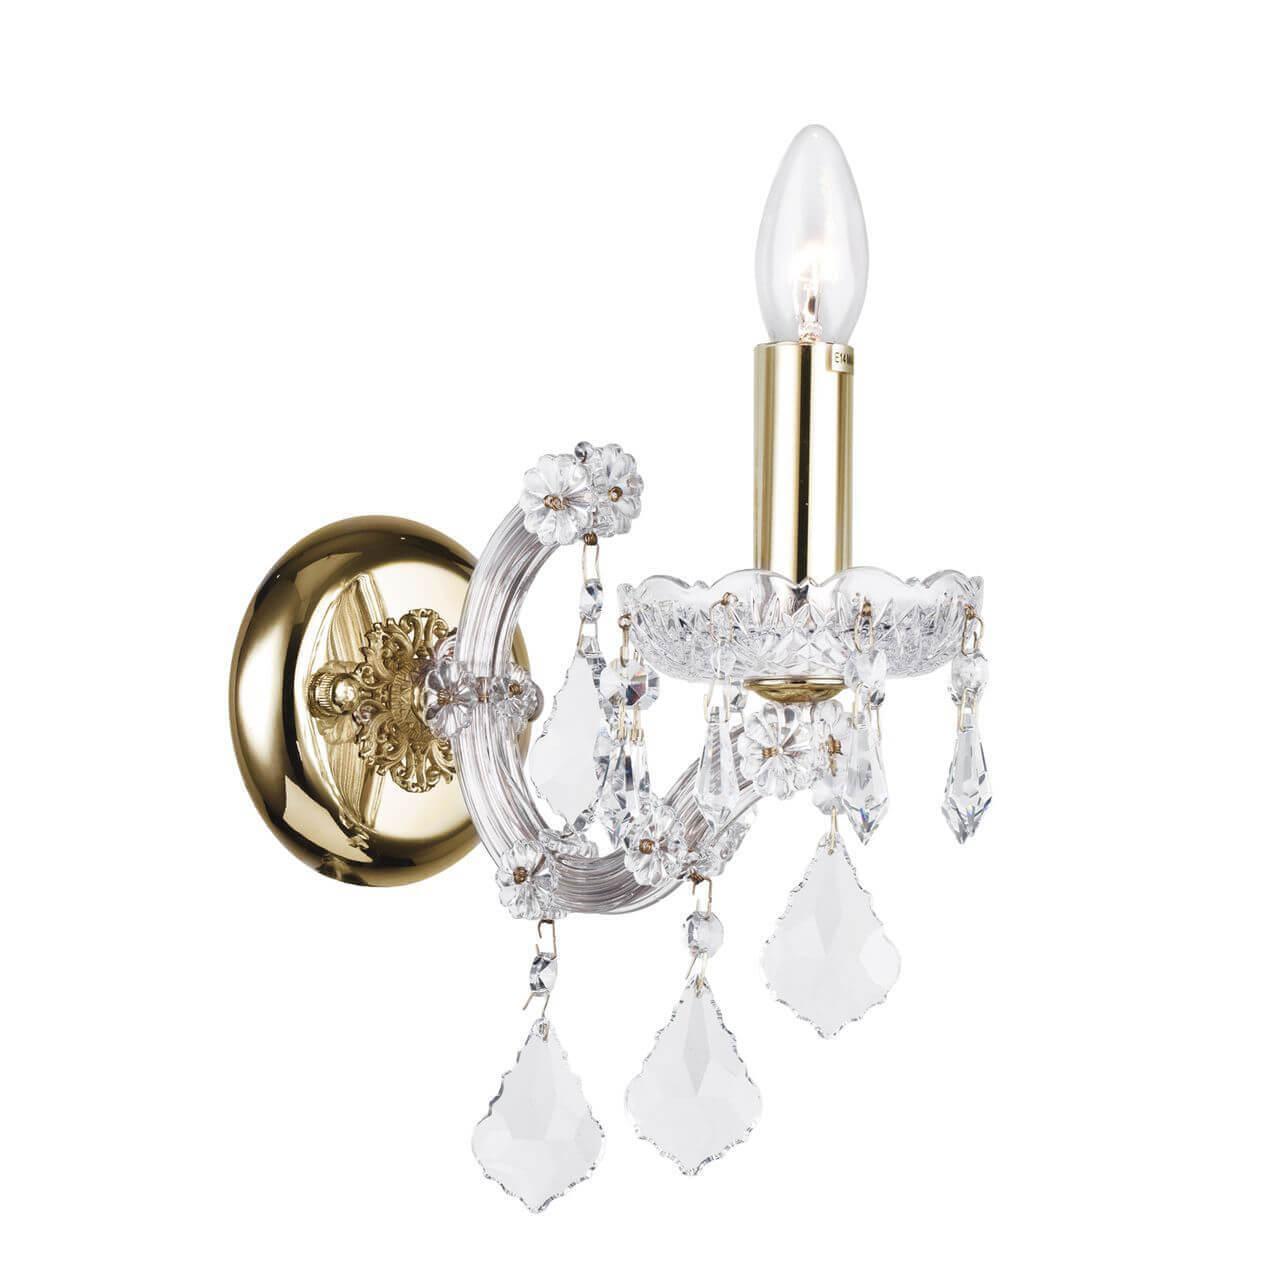 Бра Dio DArte Asfour Diamante E 2.1.1.200 G бра dio darte asfour firenze e 2 1 2 200 g